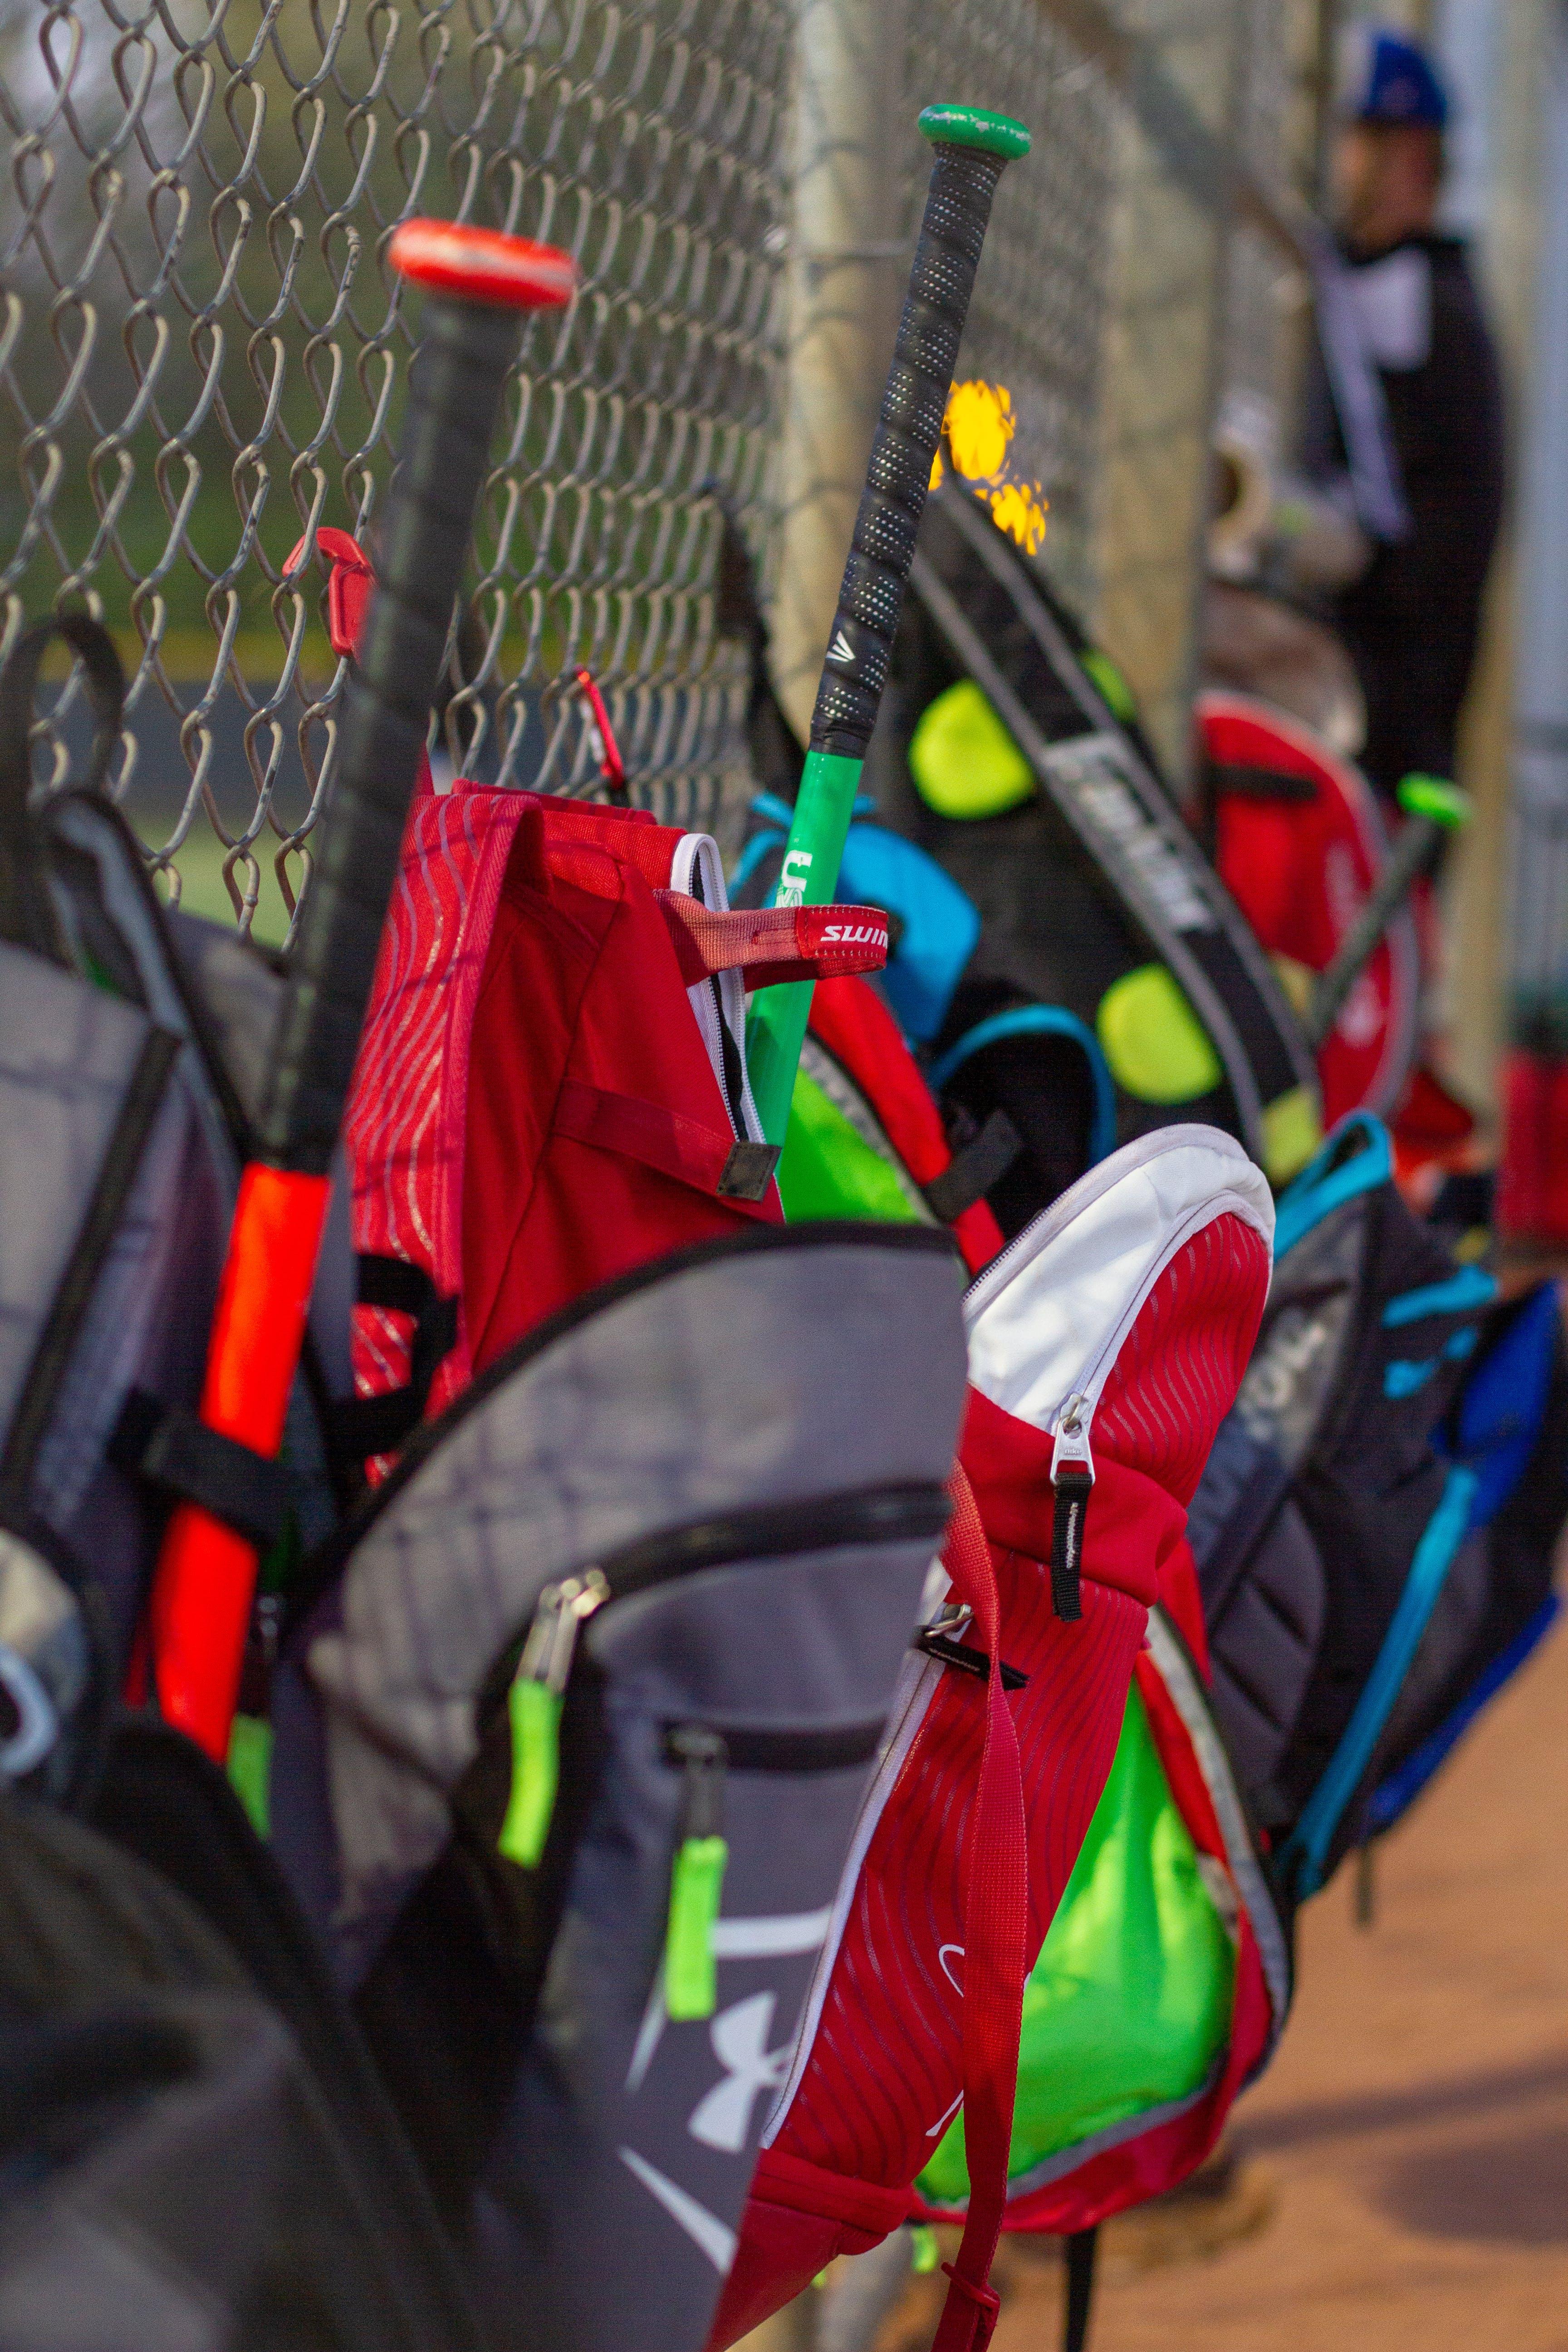 Free stock photo of bag, bags, baseball, baseball bags